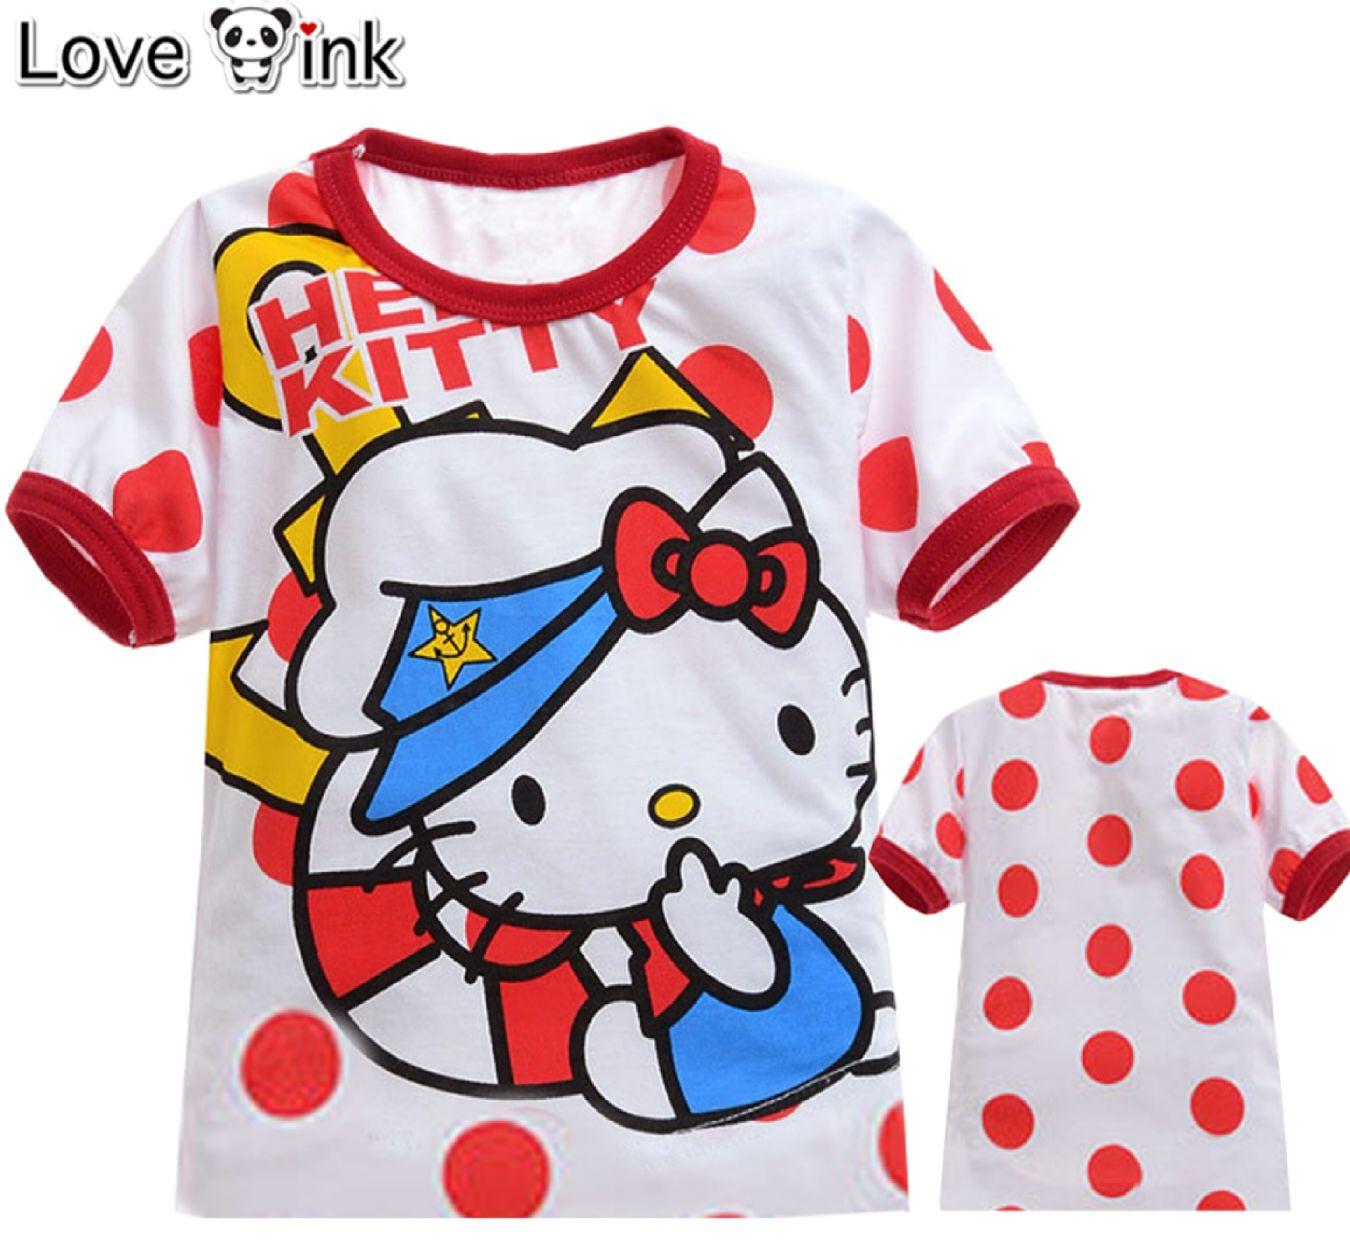 KSKD46 - Kaos Atasan Anak Hello Kitty Sailor Red Dot Murah